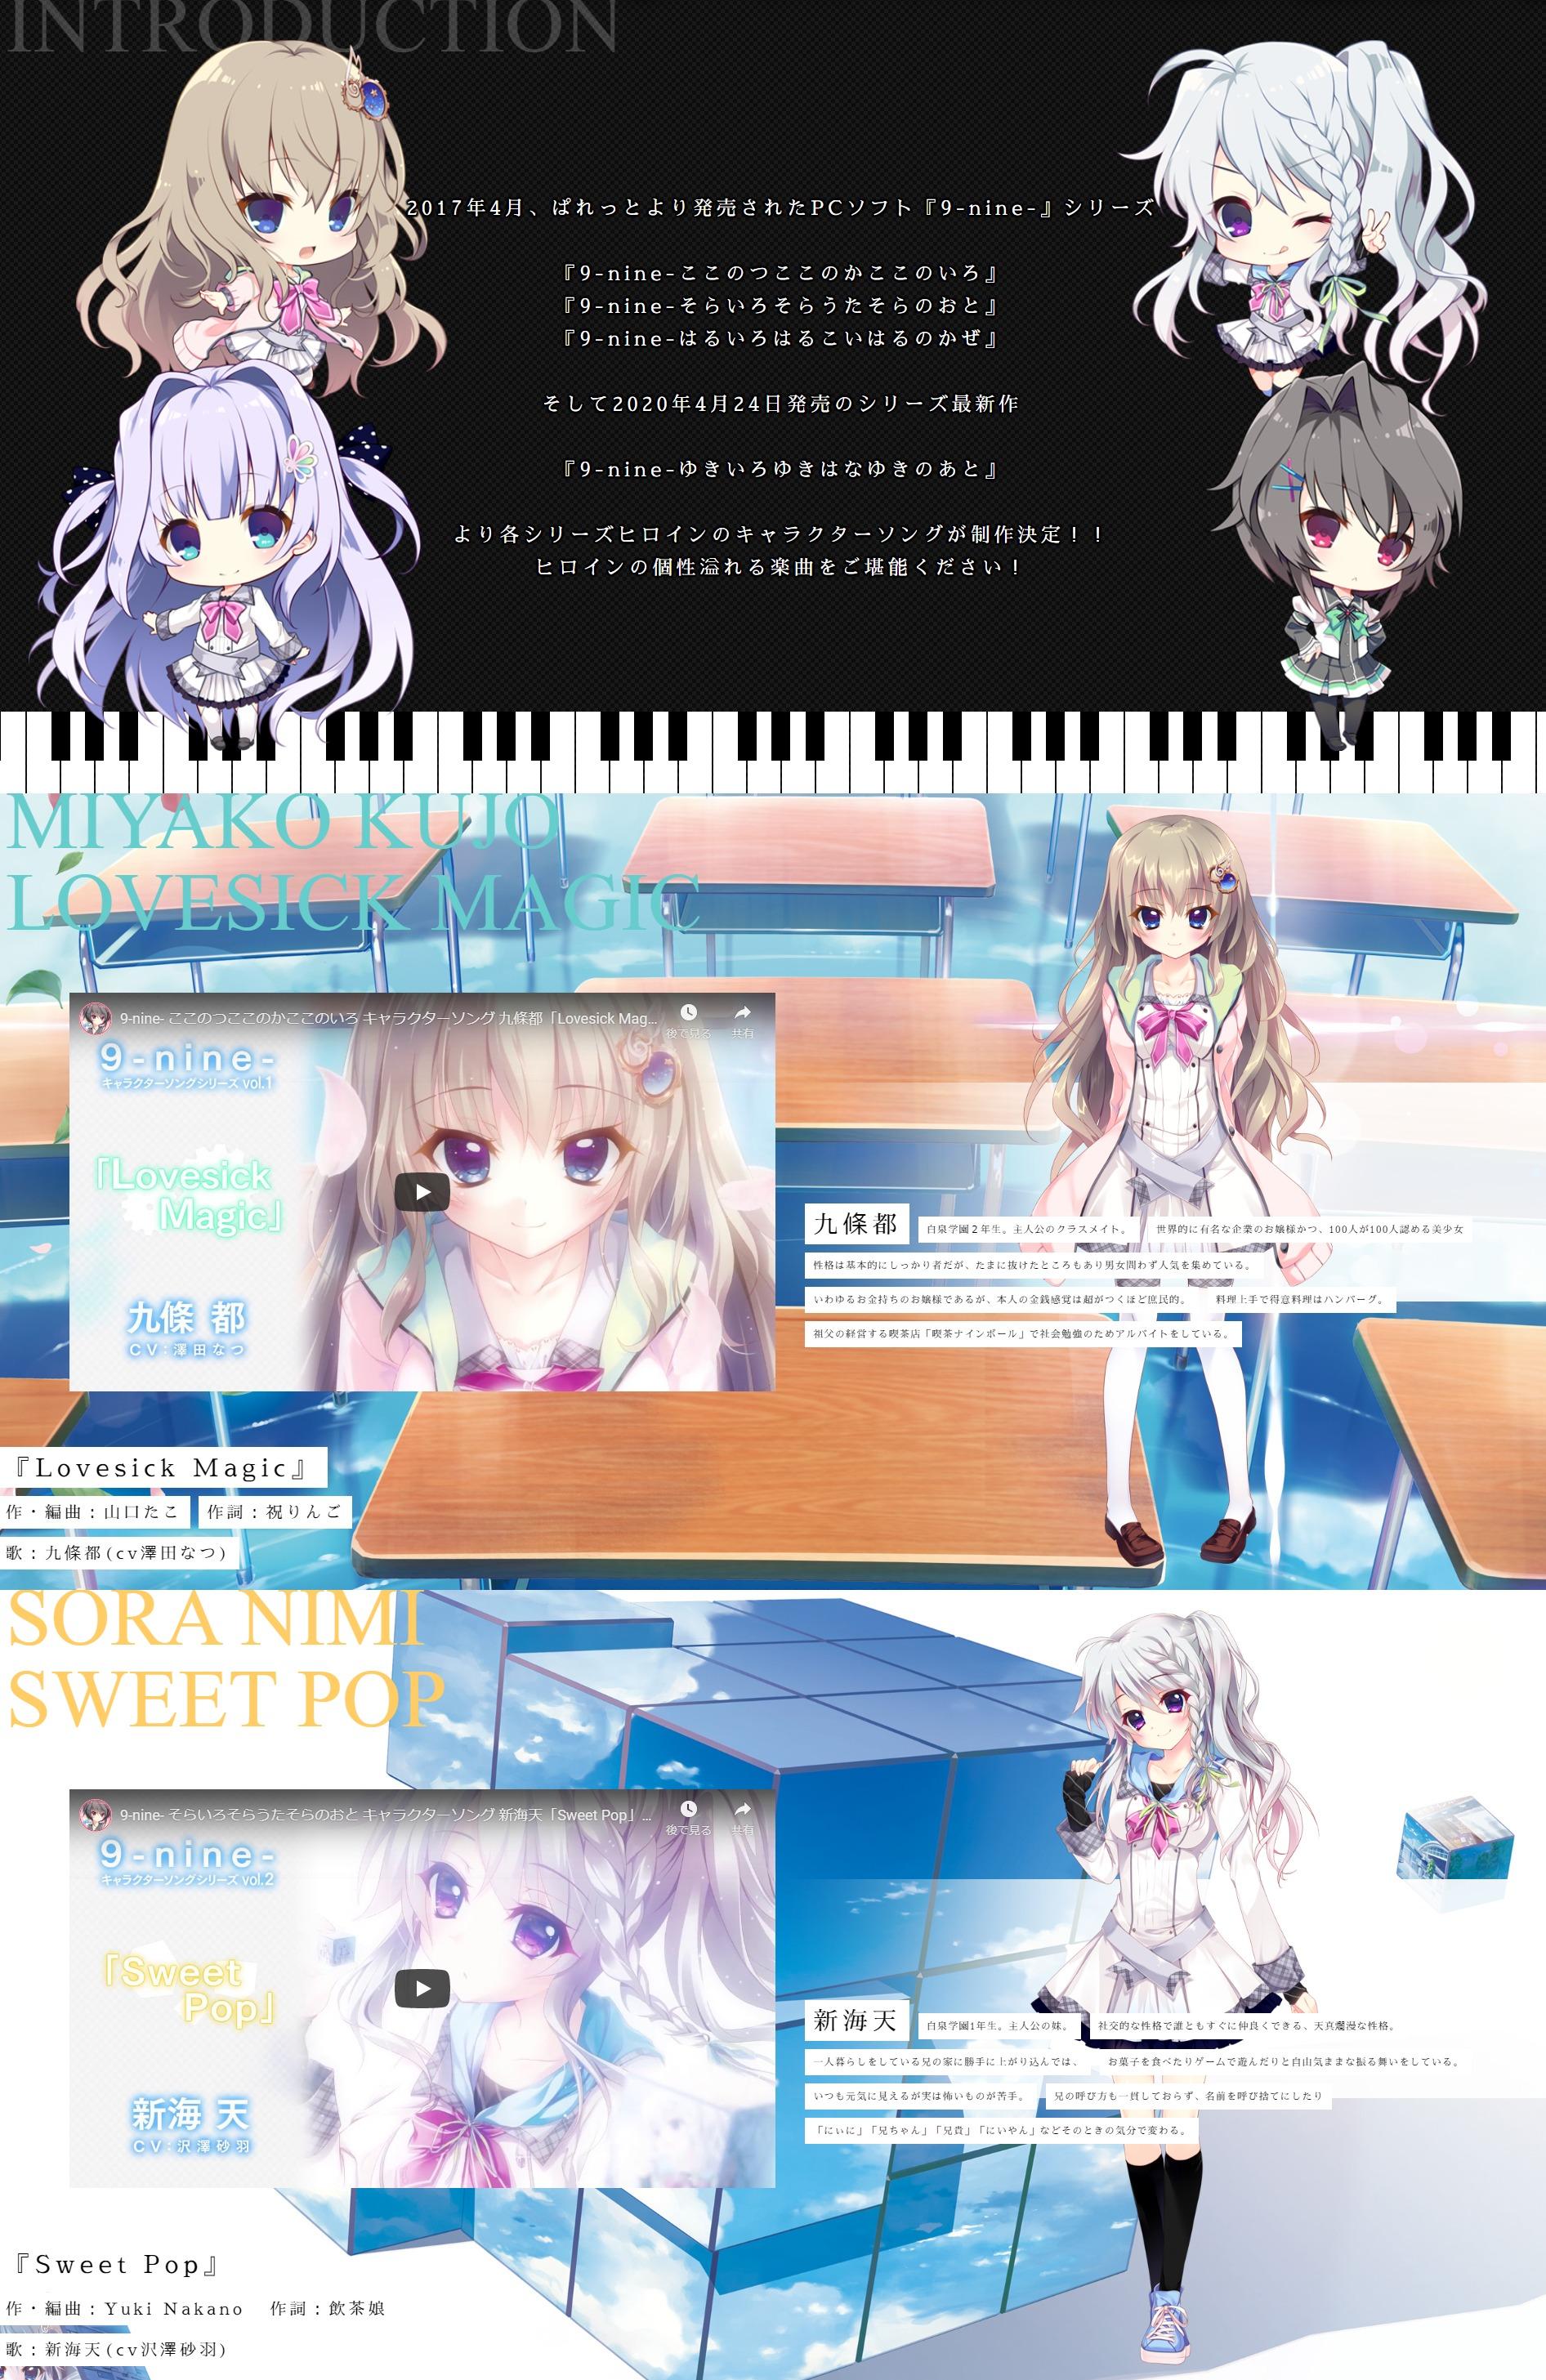 9-nine-キャラクターソング